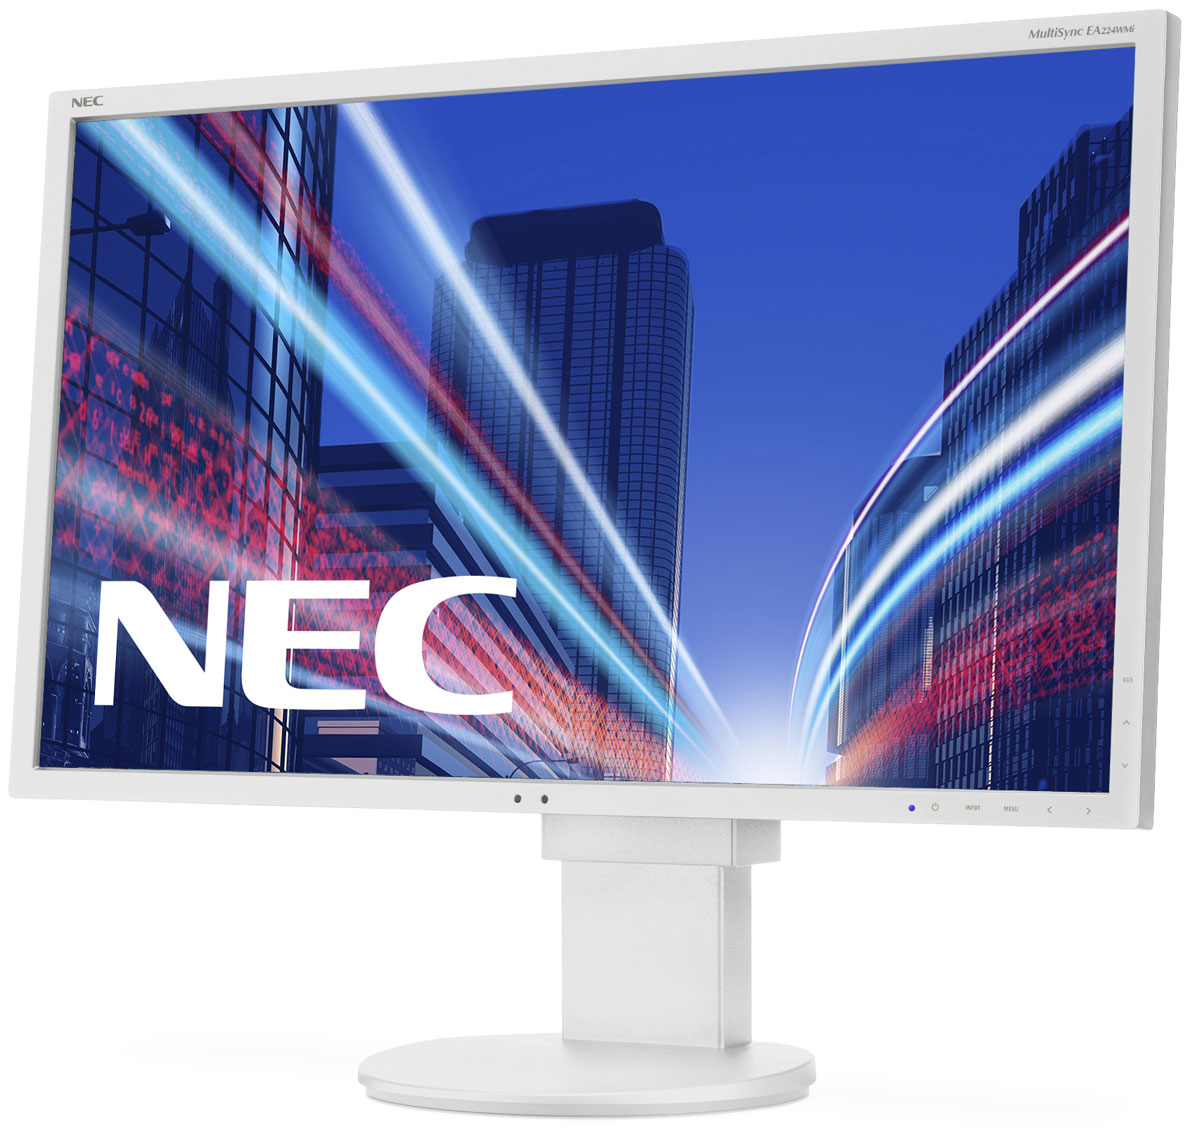 Монитор NEC EA224WMi, White